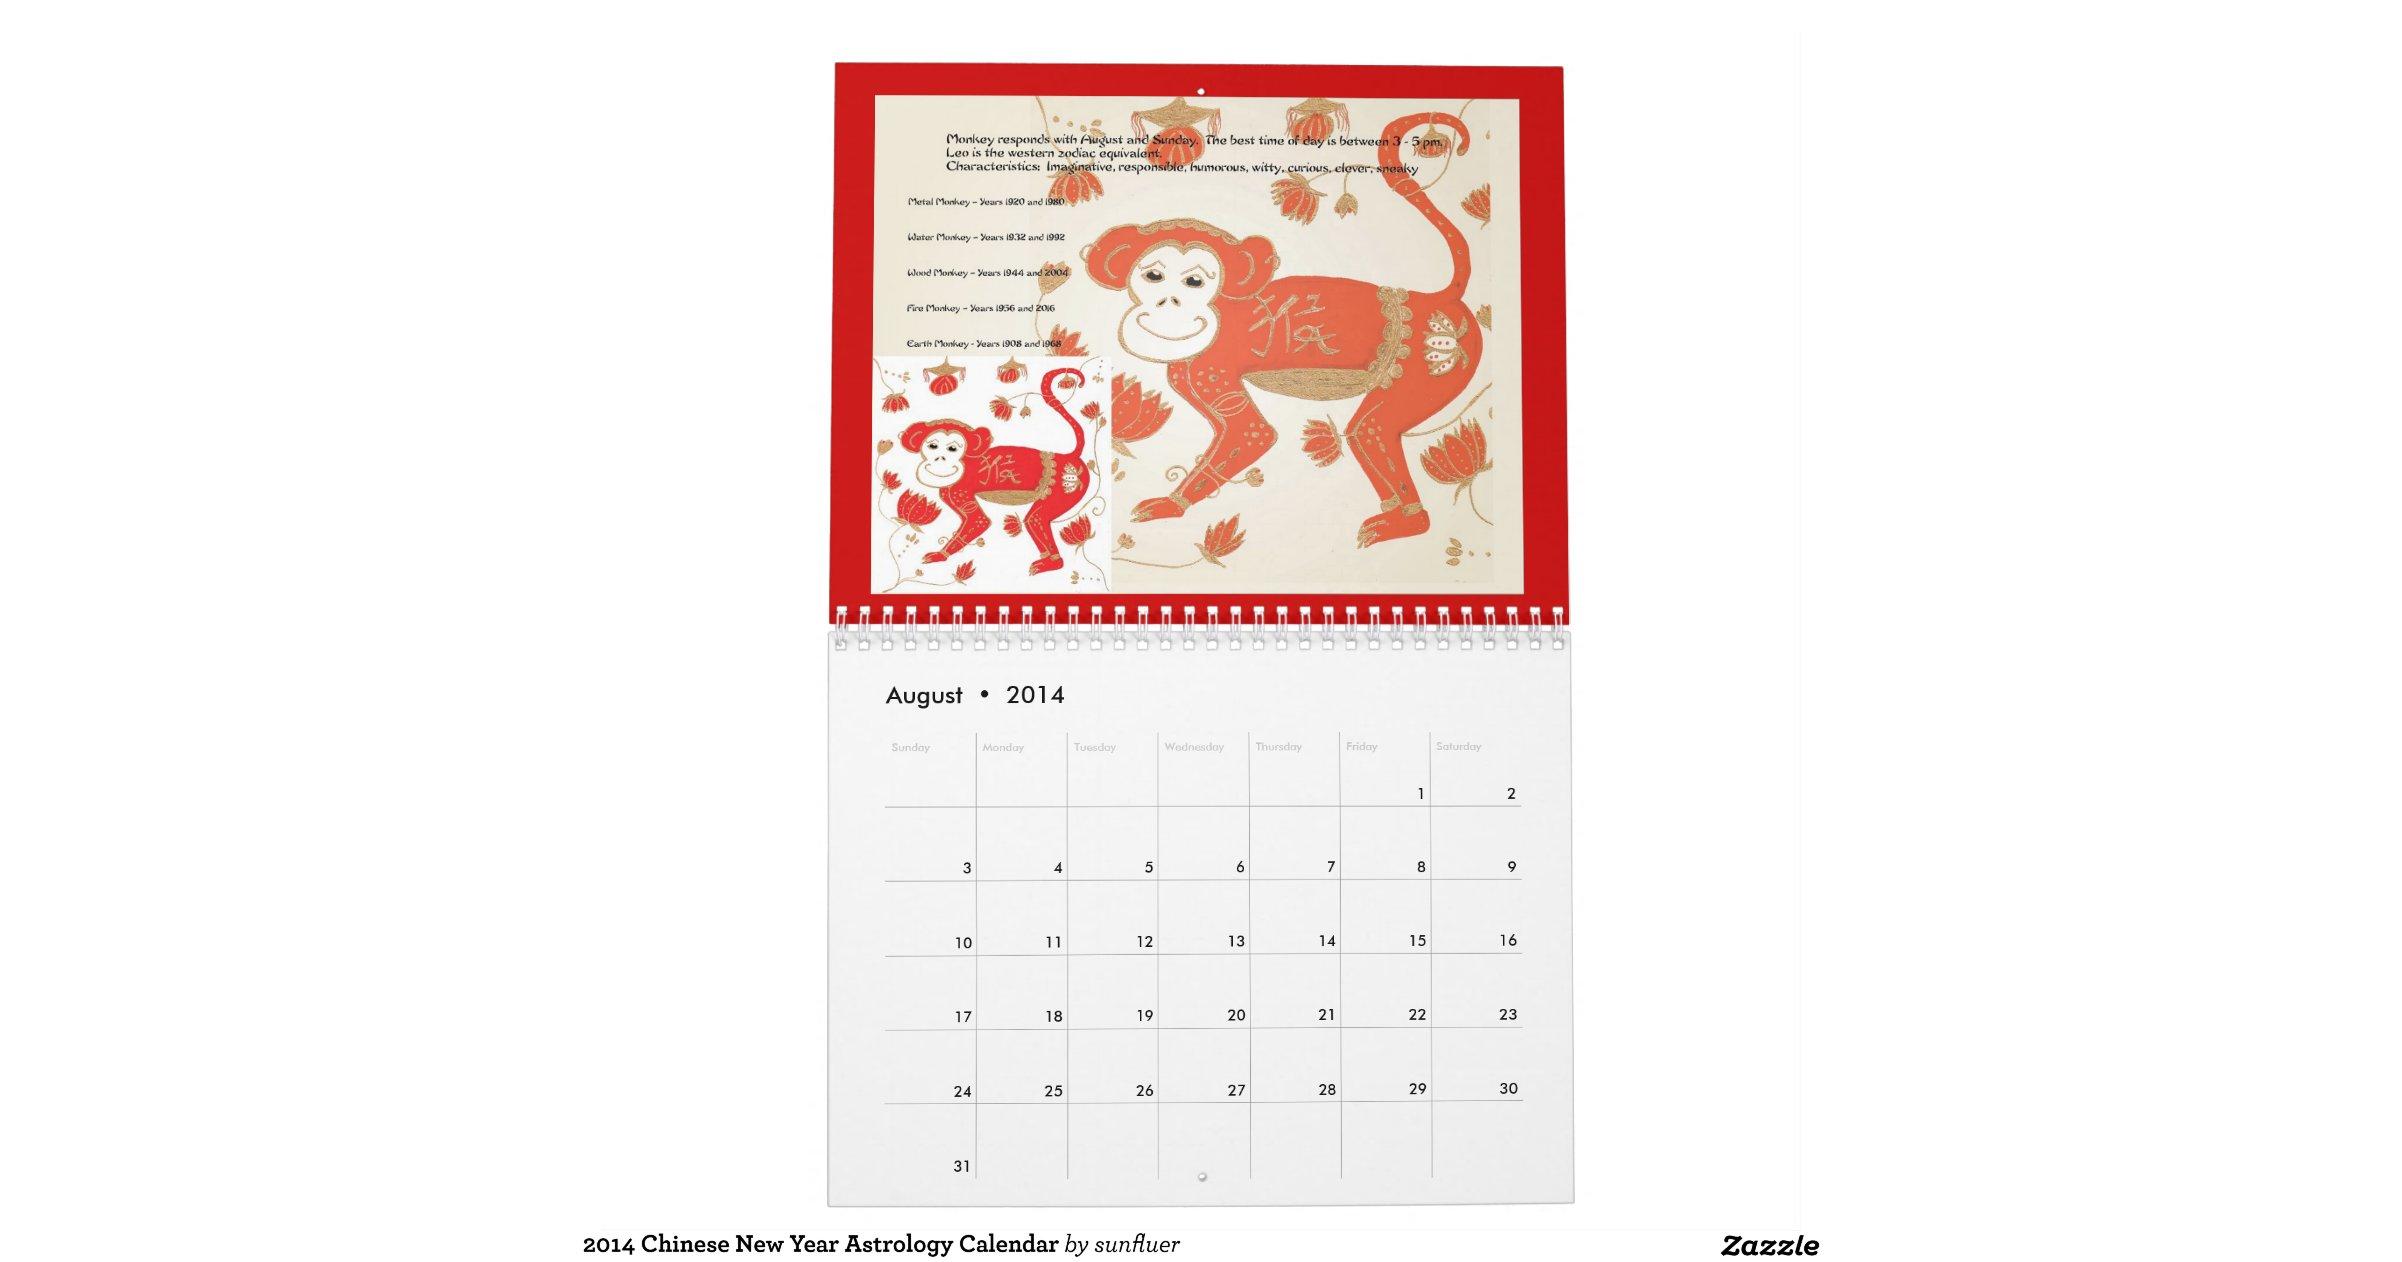 Year Calendar Jsf : Chinese new year astrology calendar